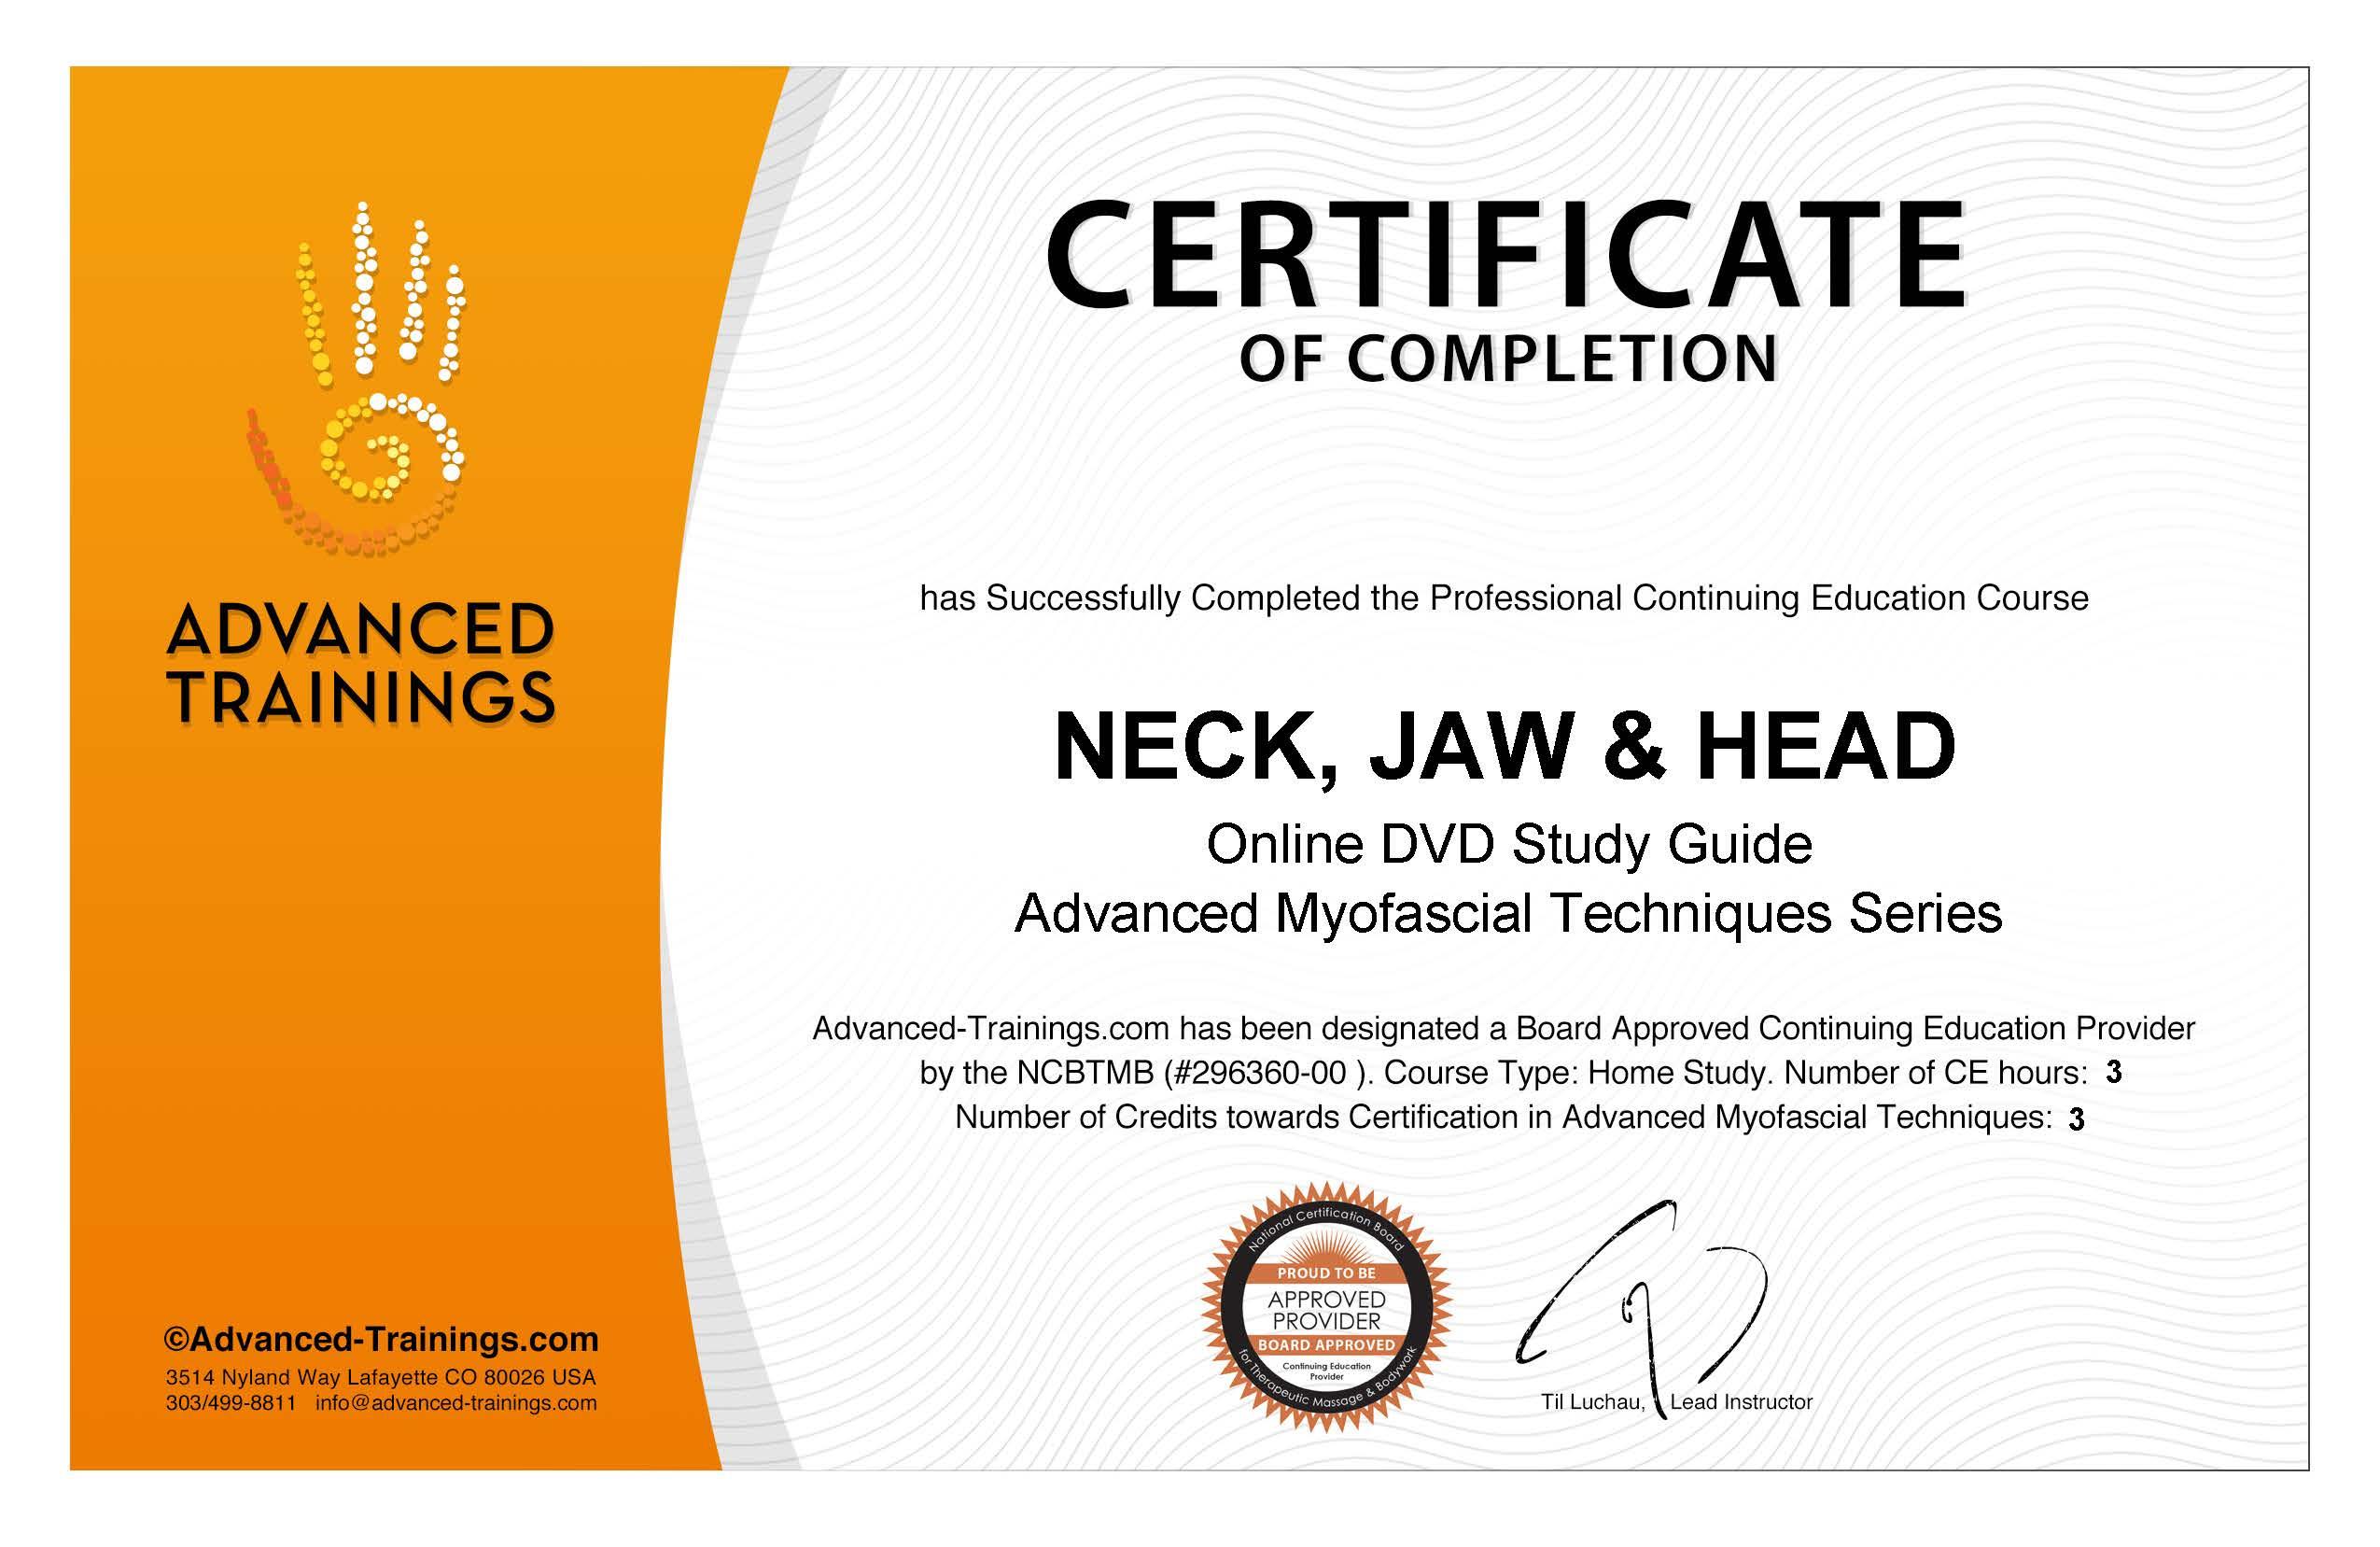 Neck Jaw Head Adv Myofascial Techniques Online Video